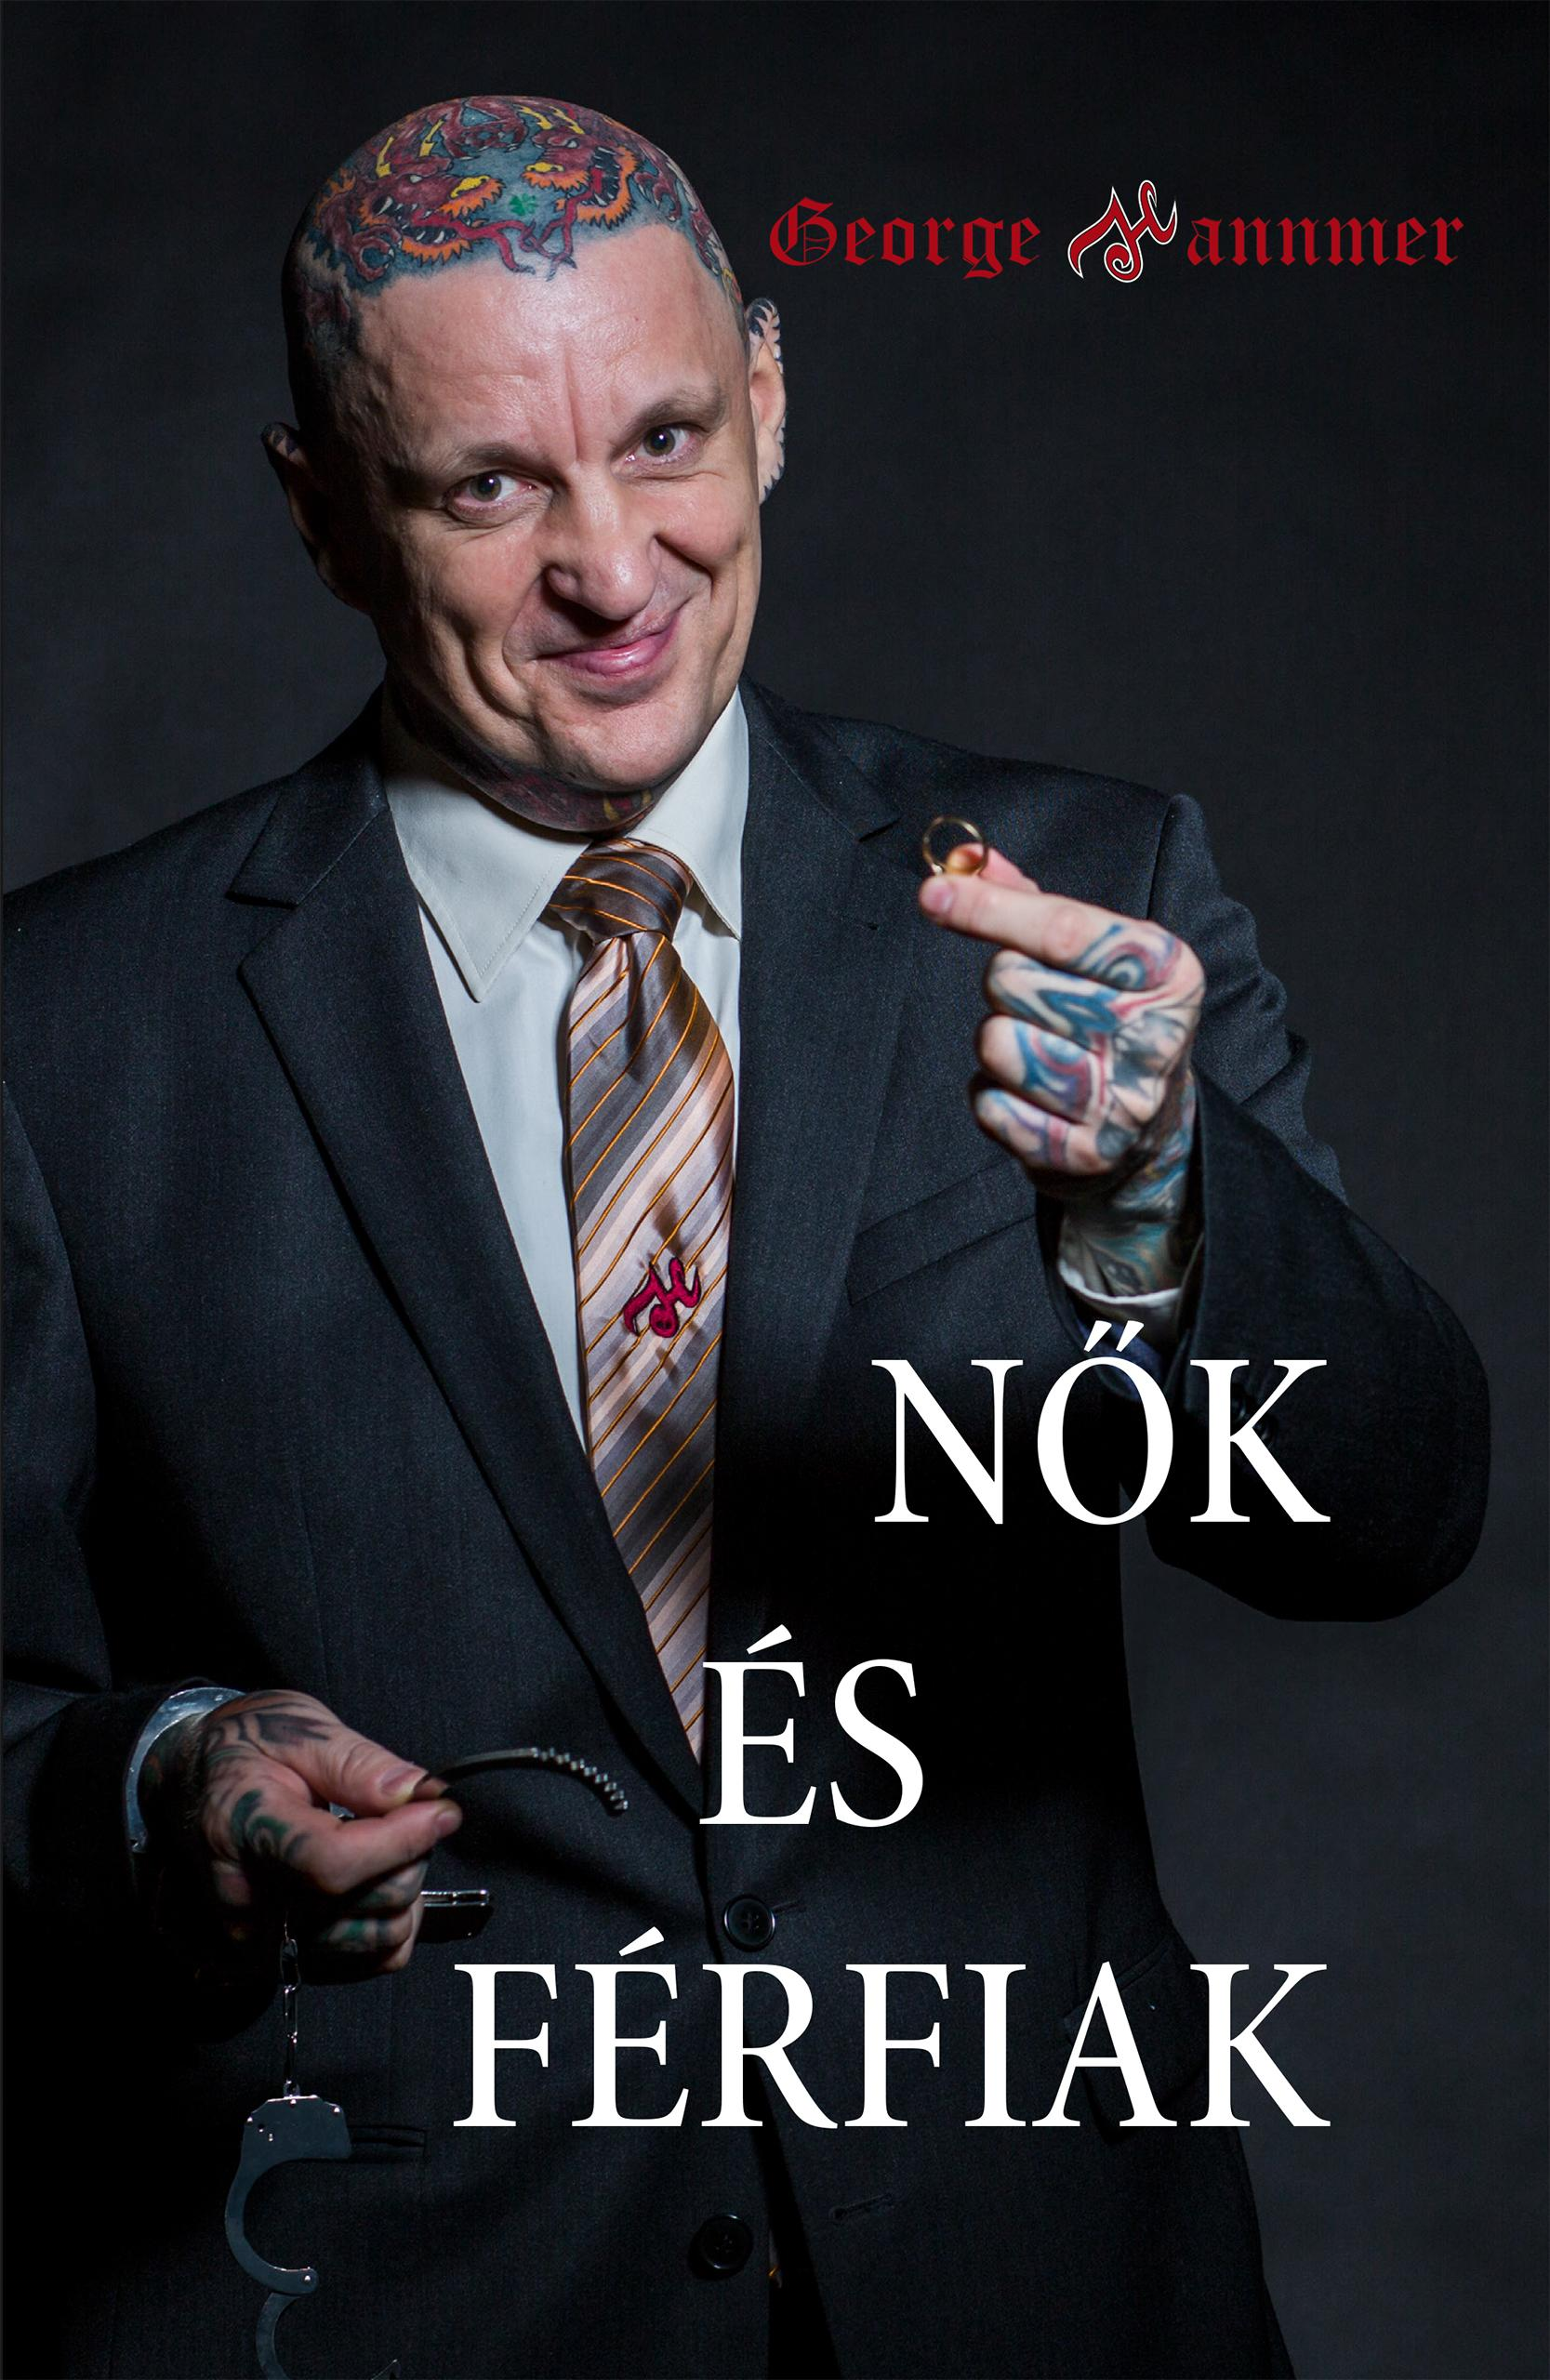 GEORGE HANNMER - NŐK ÉS FÉRFIAK